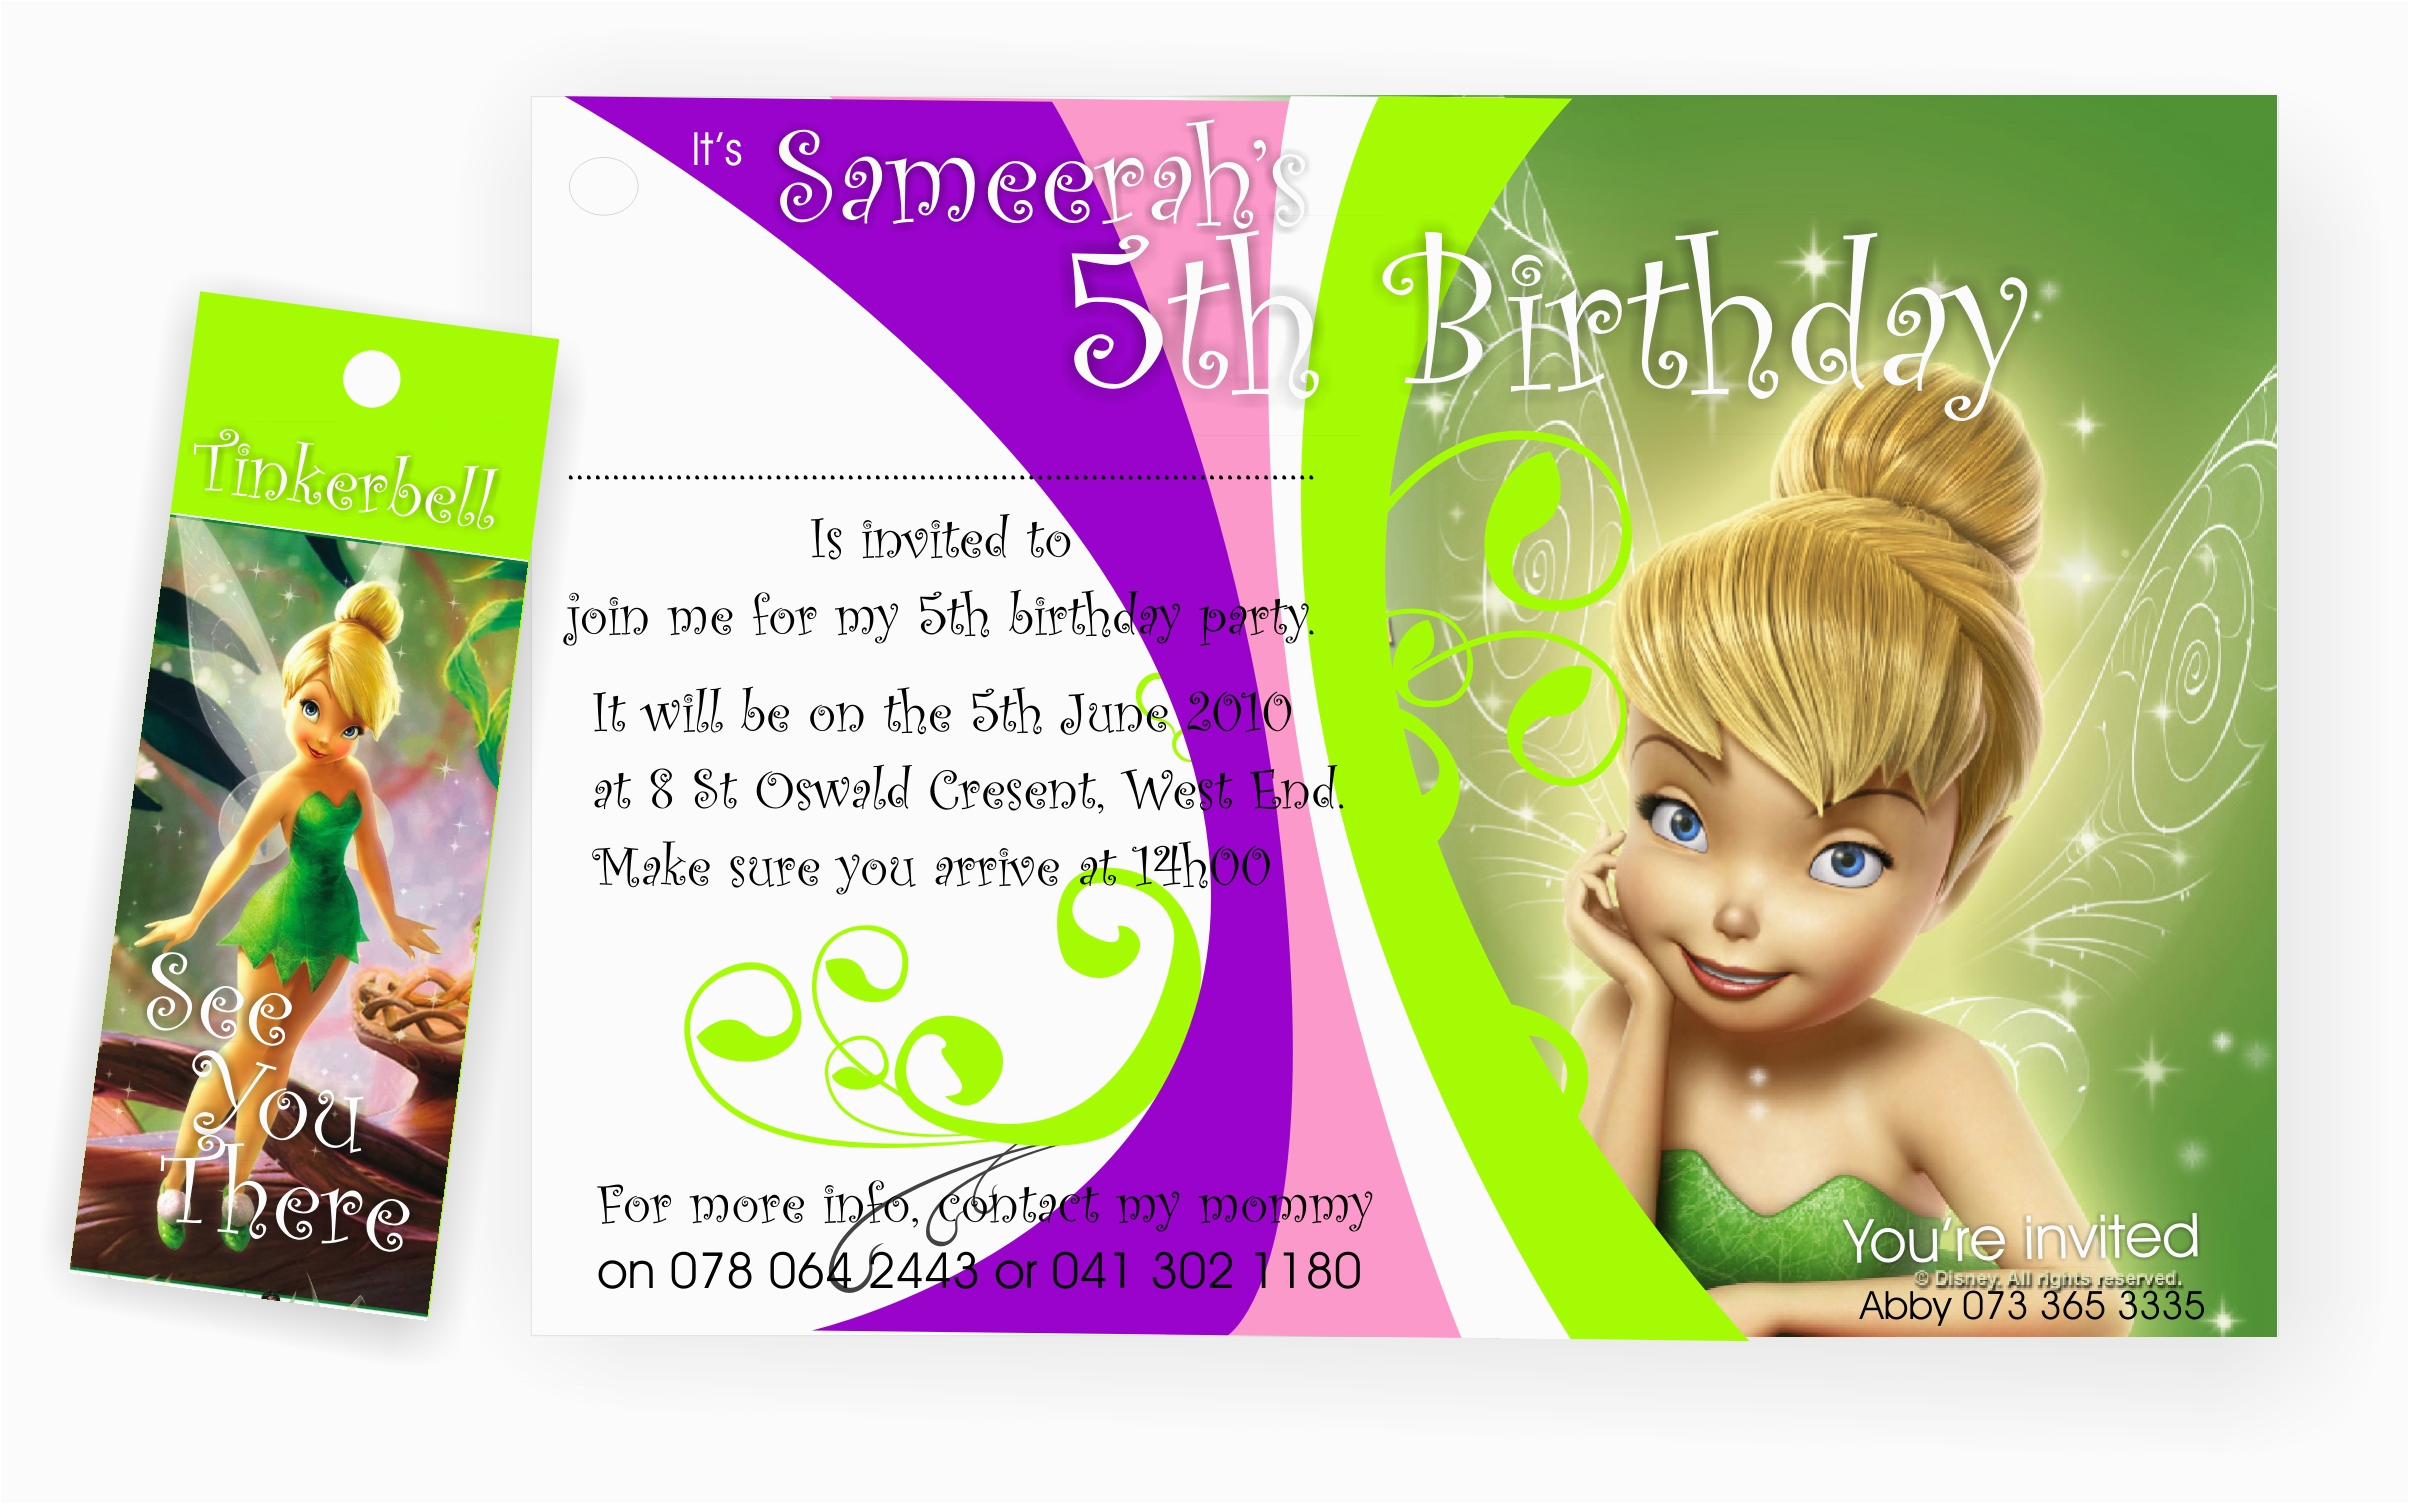 5th birthday party invitation